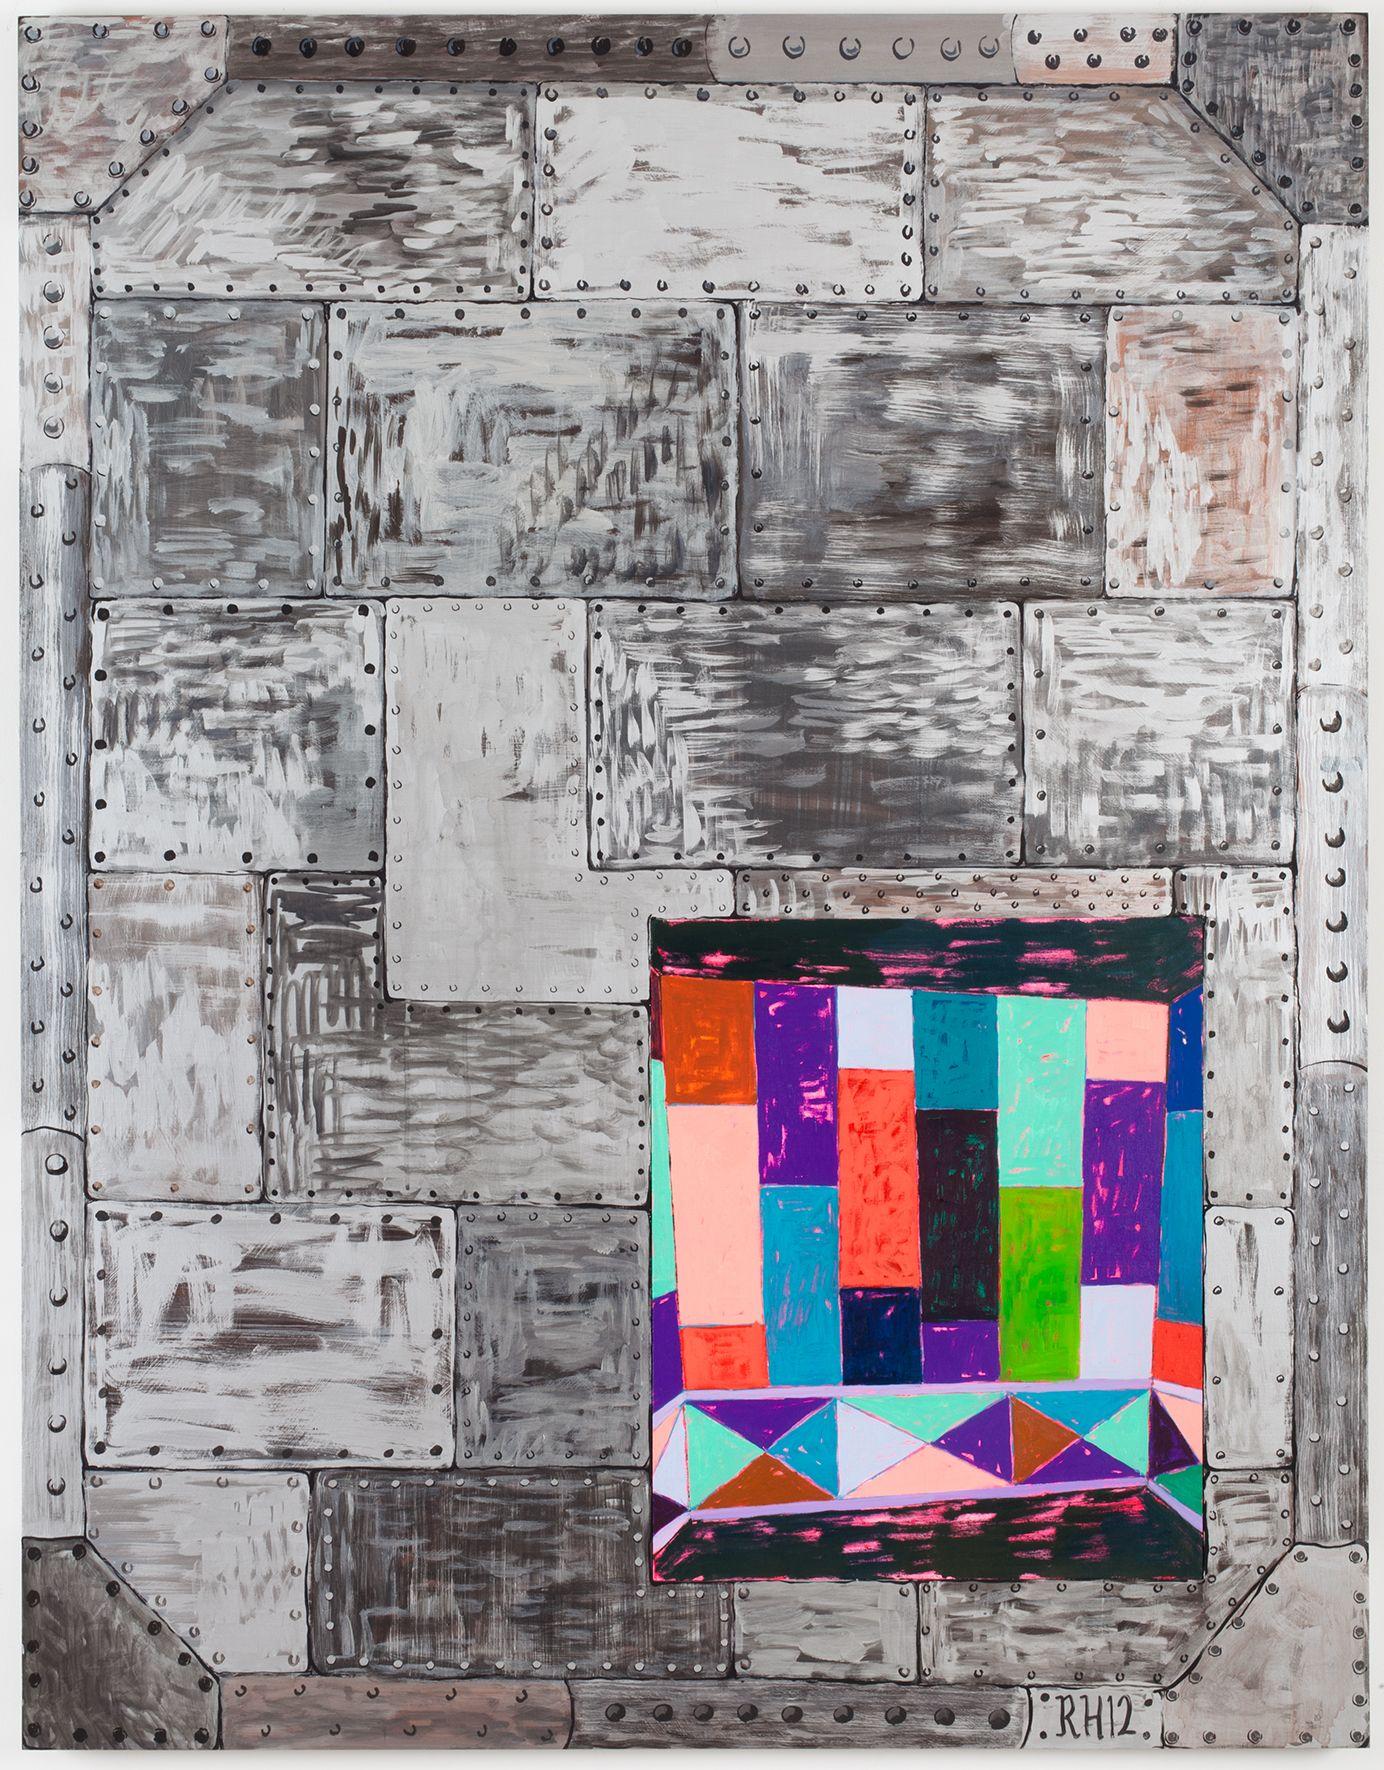 Richard Hawkins Vault #4, 2012 Oil on canvas and acrylic on panel 63 x 49 x 1 5/8 inches 160 x 124.5 x 4.1 cm